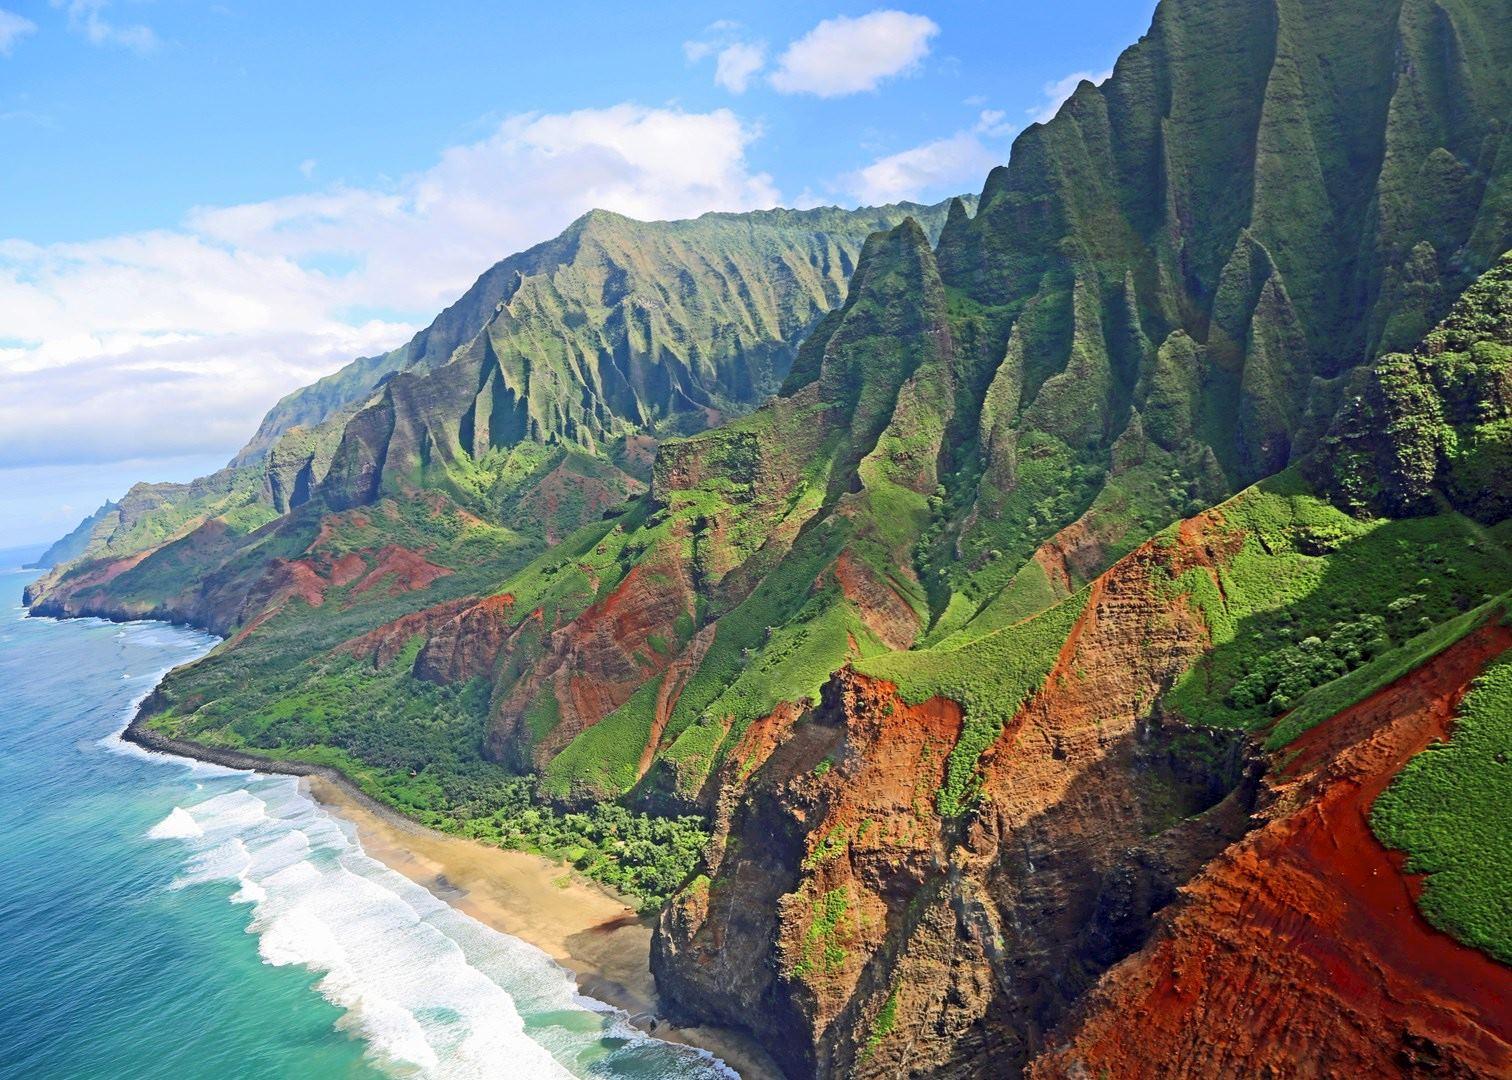 Kauai Hawaii: Visit Kauai On A Trip To Hawaii